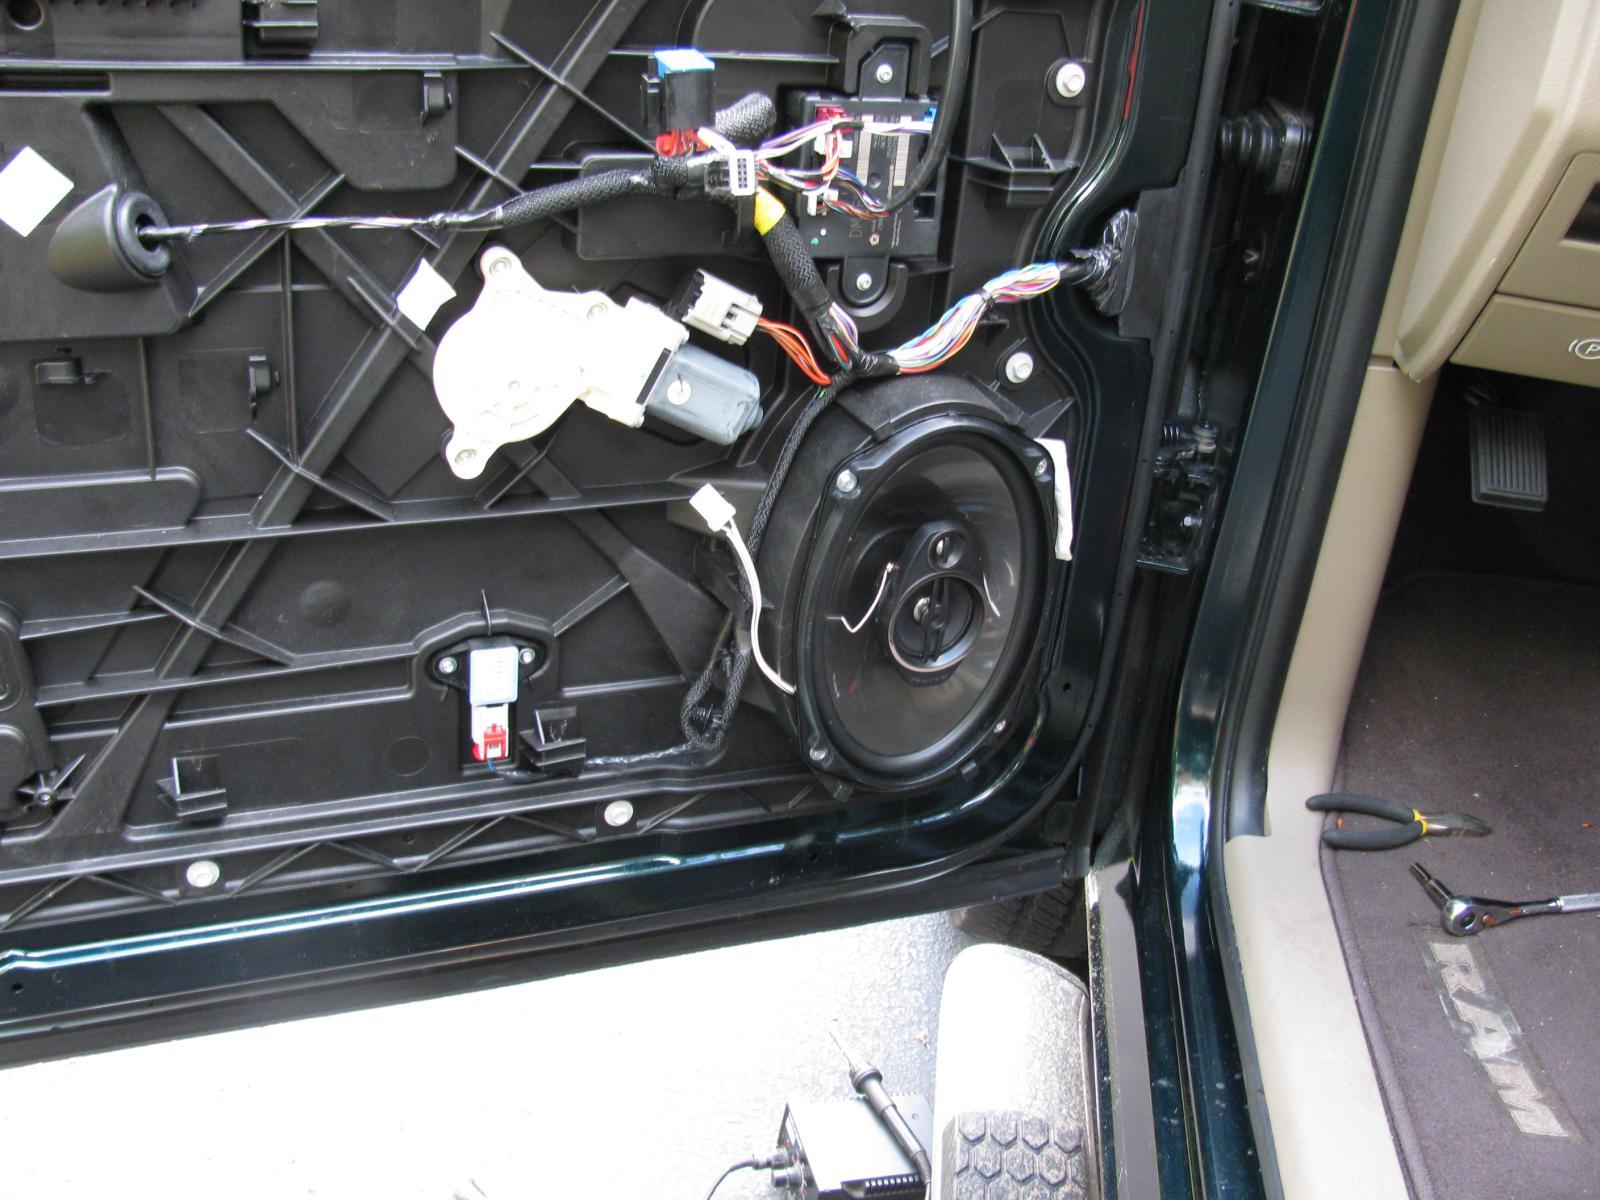 Dodge Ram 2500 Wiring Diagram Further Dodge Ram Tow Mirror Wiring